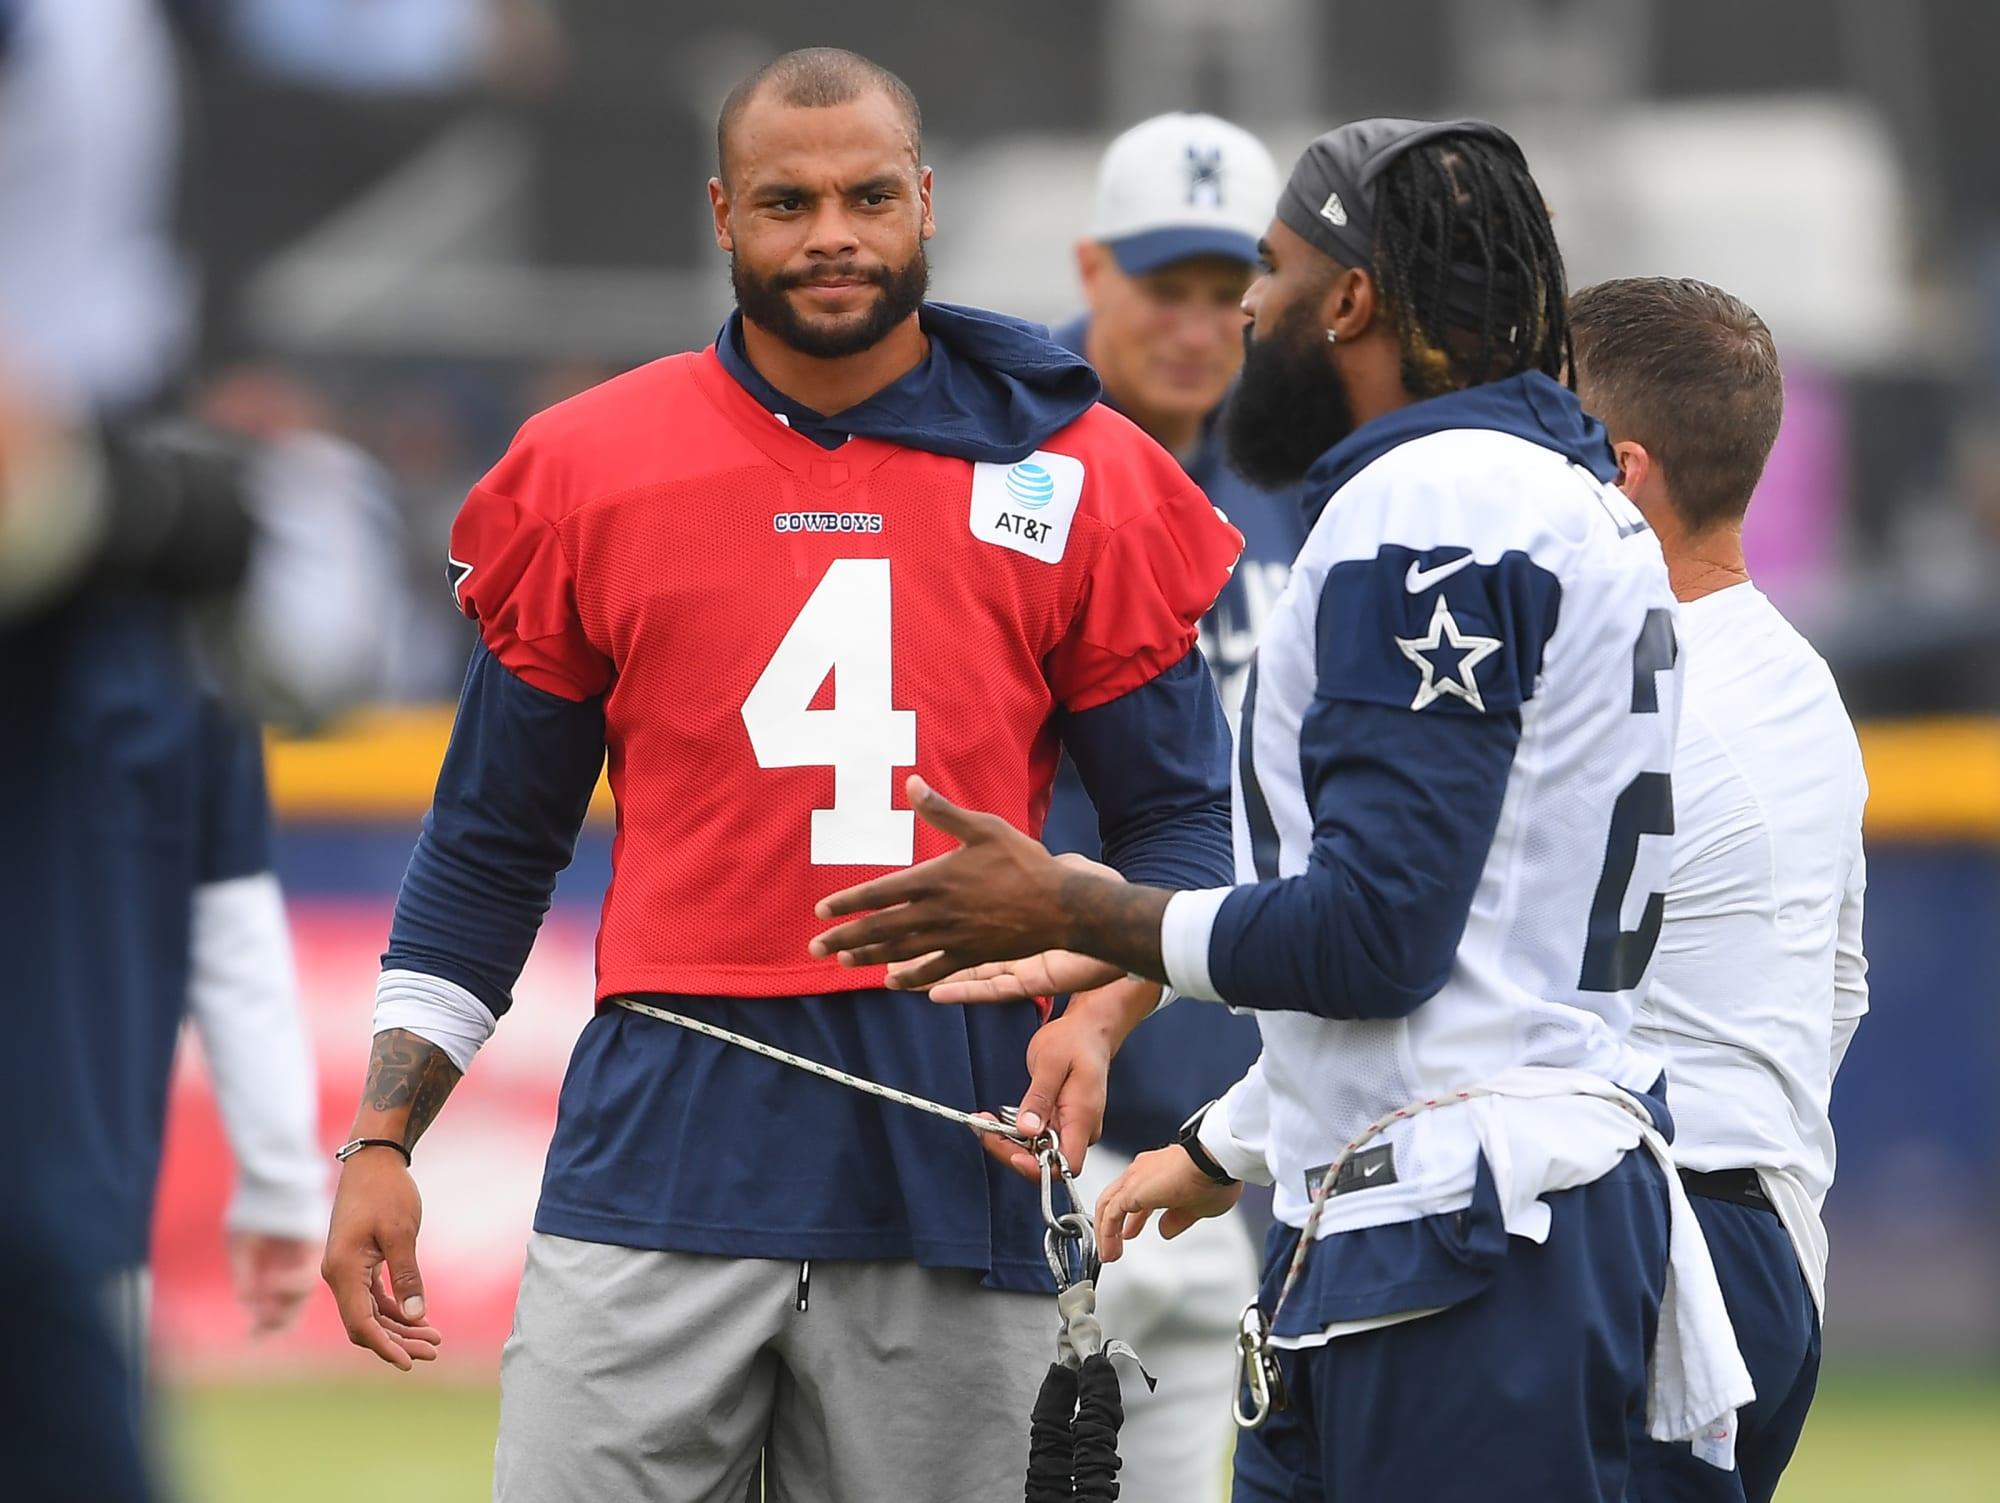 Cowboys get bad news on Dak Prescott's shoulder injury